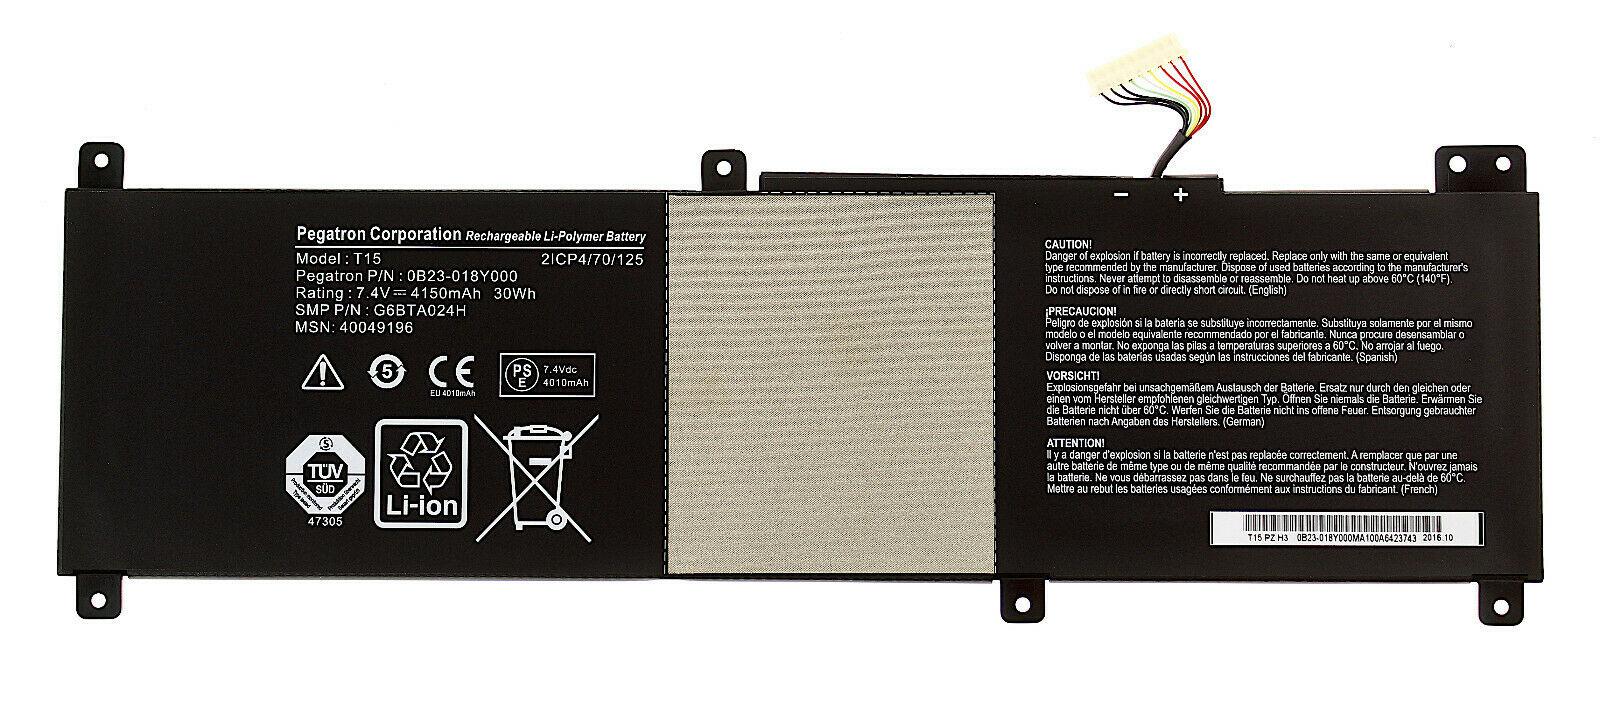 Batterie pour 7.4V 4150mAh Medion S6213T S6214T S6413T T15 0B23-018Y000 (compatible)